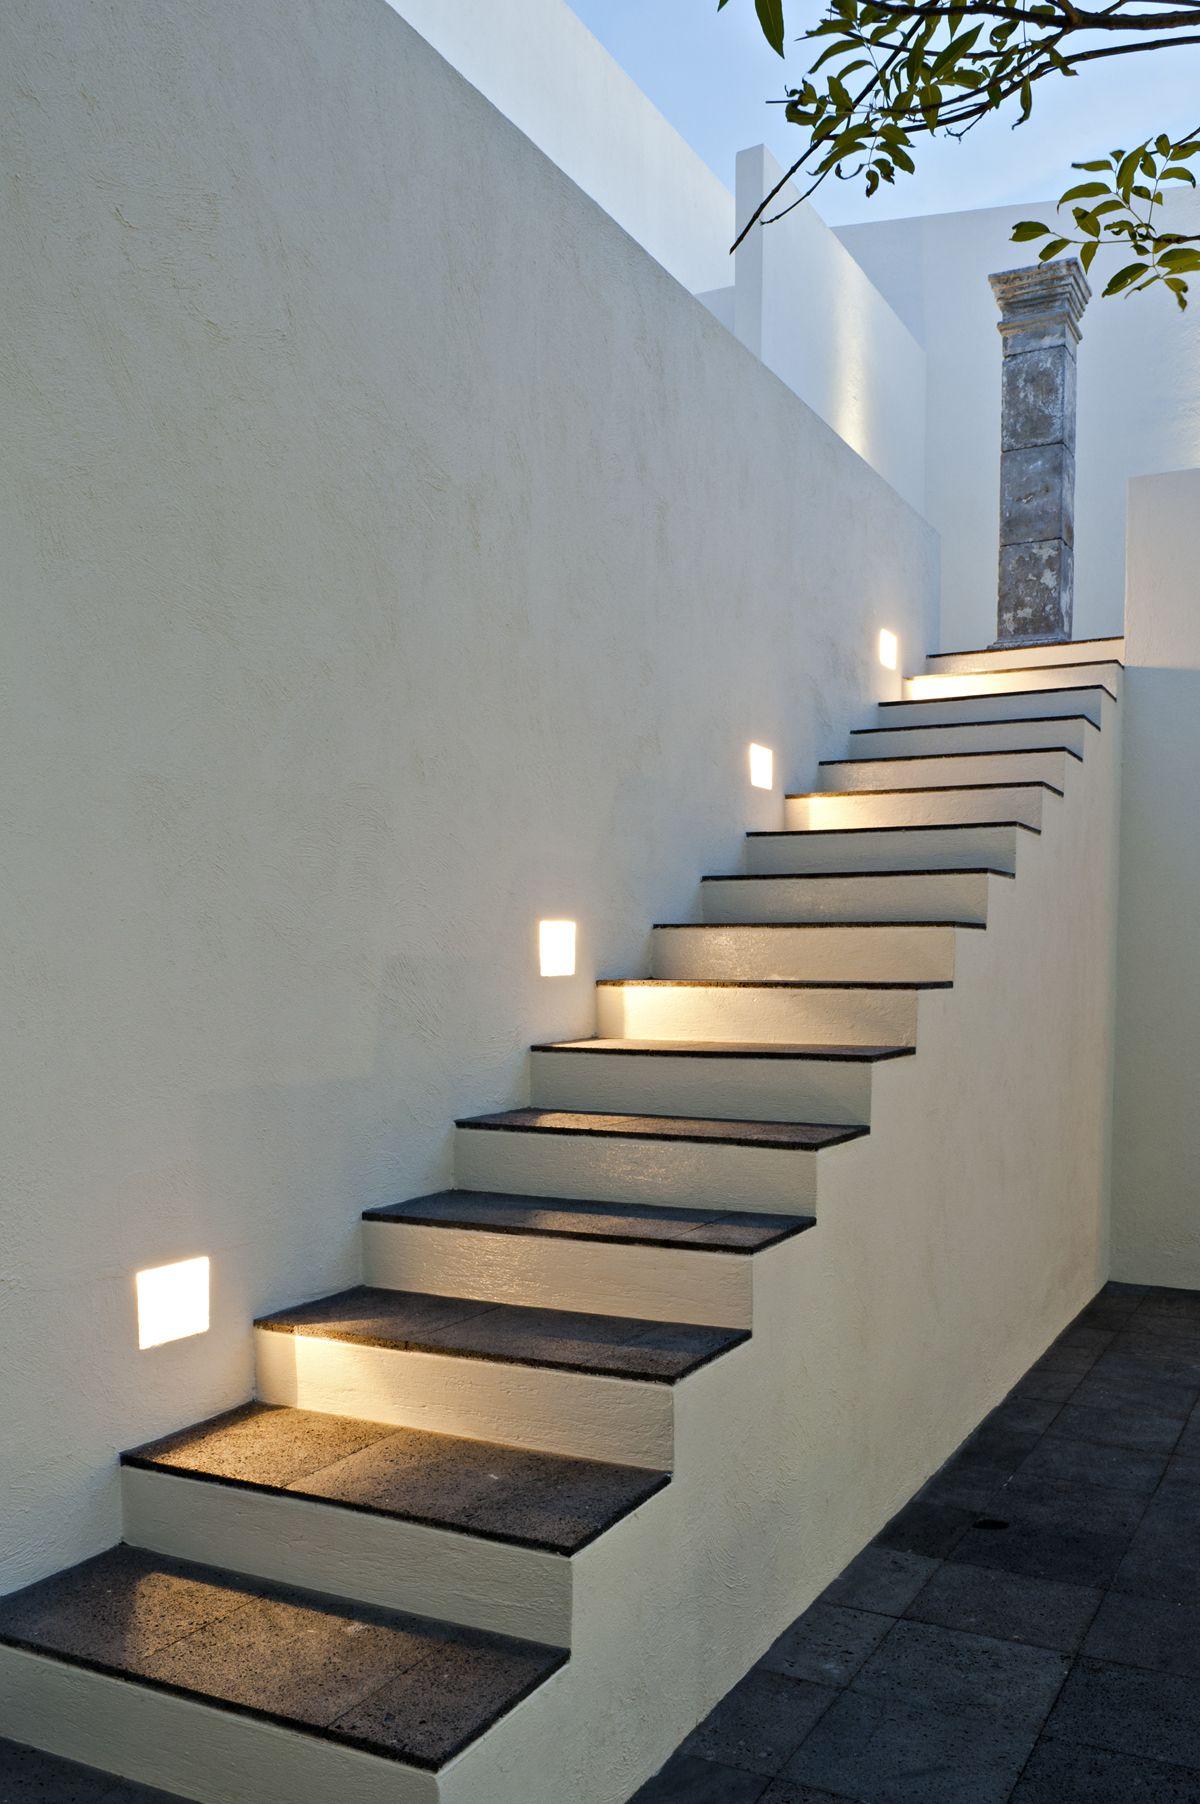 Ilumina tus escaleras con empotrados tecnolite iluminaci n exterior iluminaci n escaleras - Iluminacion de escaleras ...